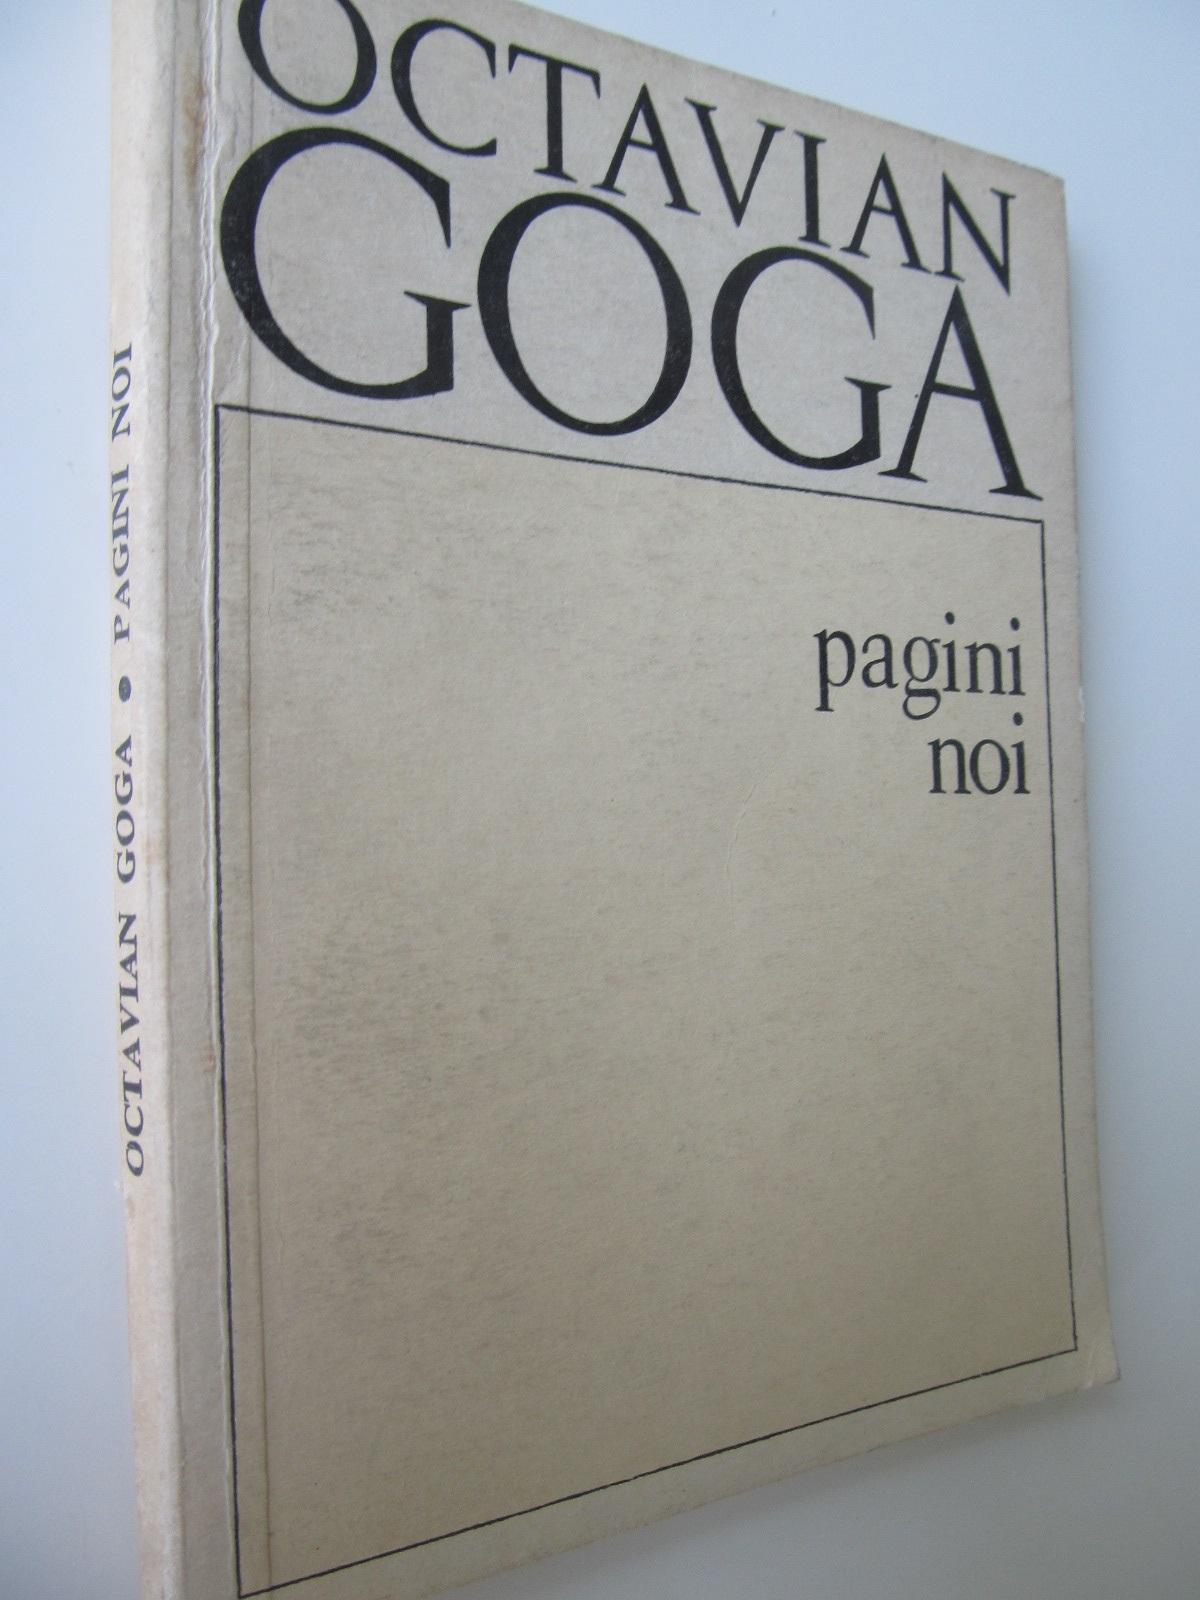 Pagini noi - Octavian Goga | Detalii carte